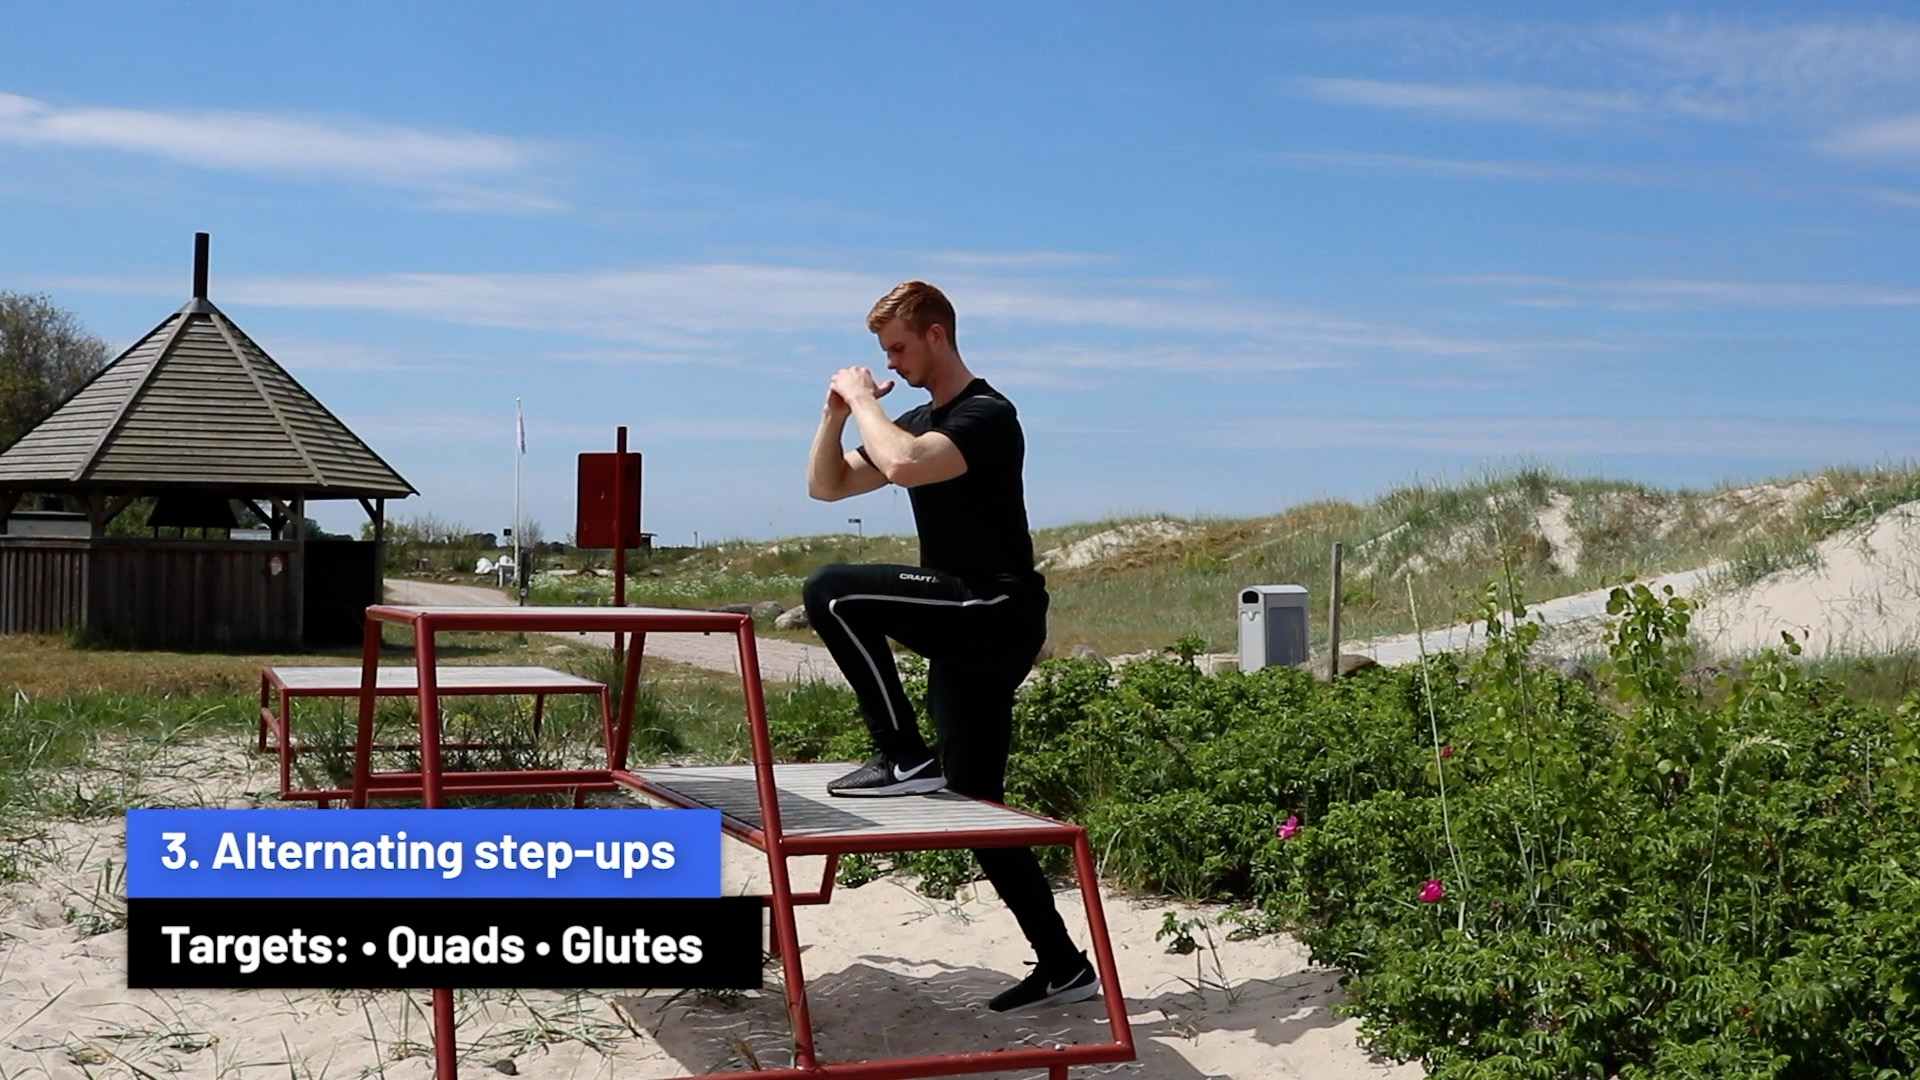 Alternating step-ups